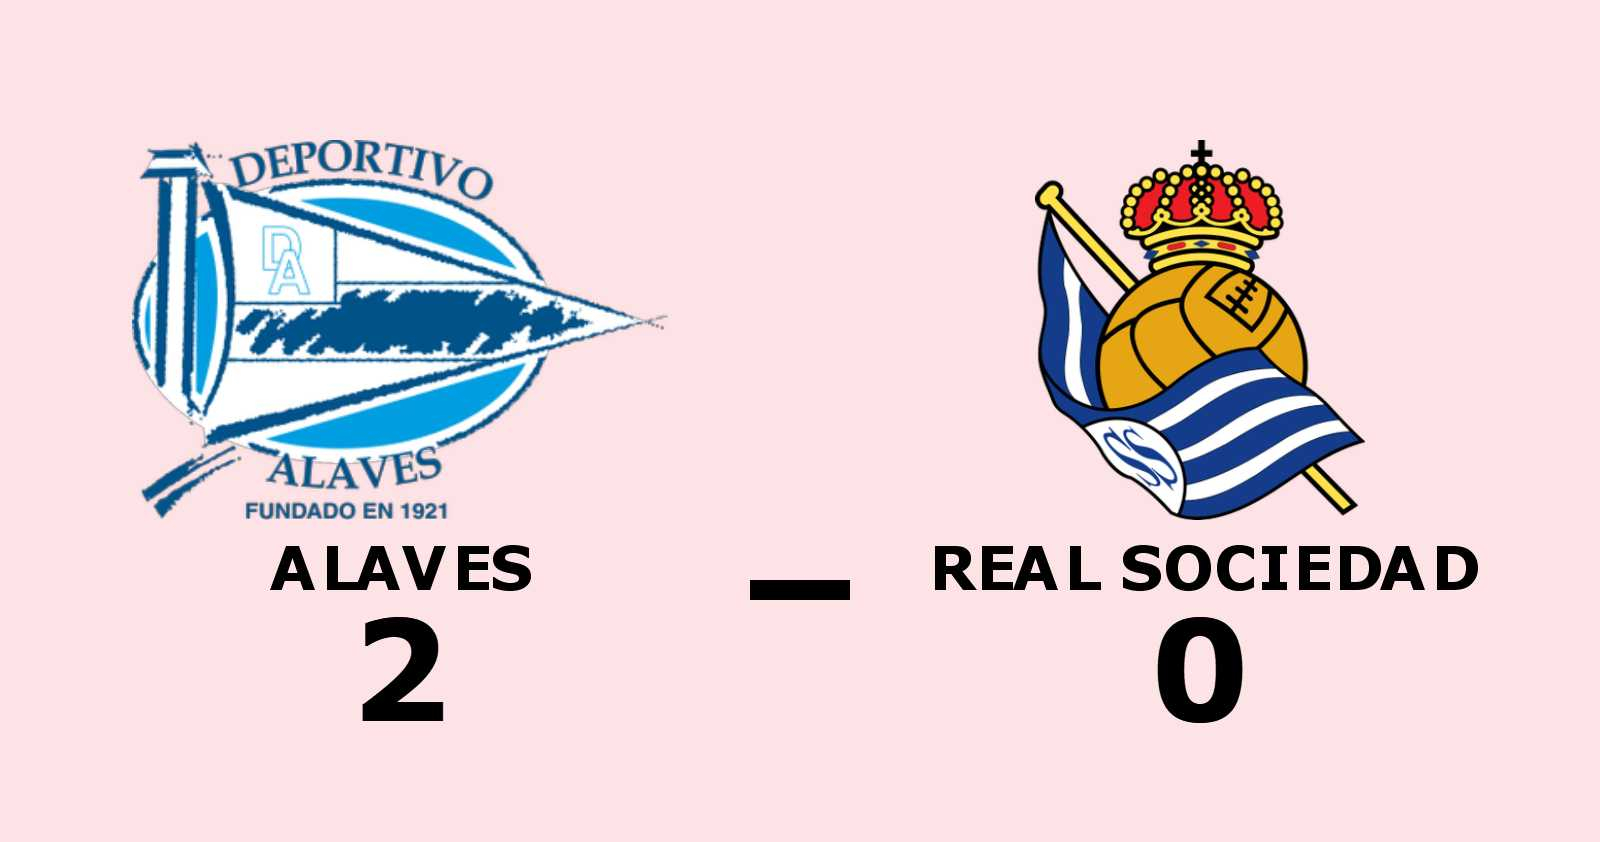 Aguirregabiria och Sainz sänkte Real Sociedad